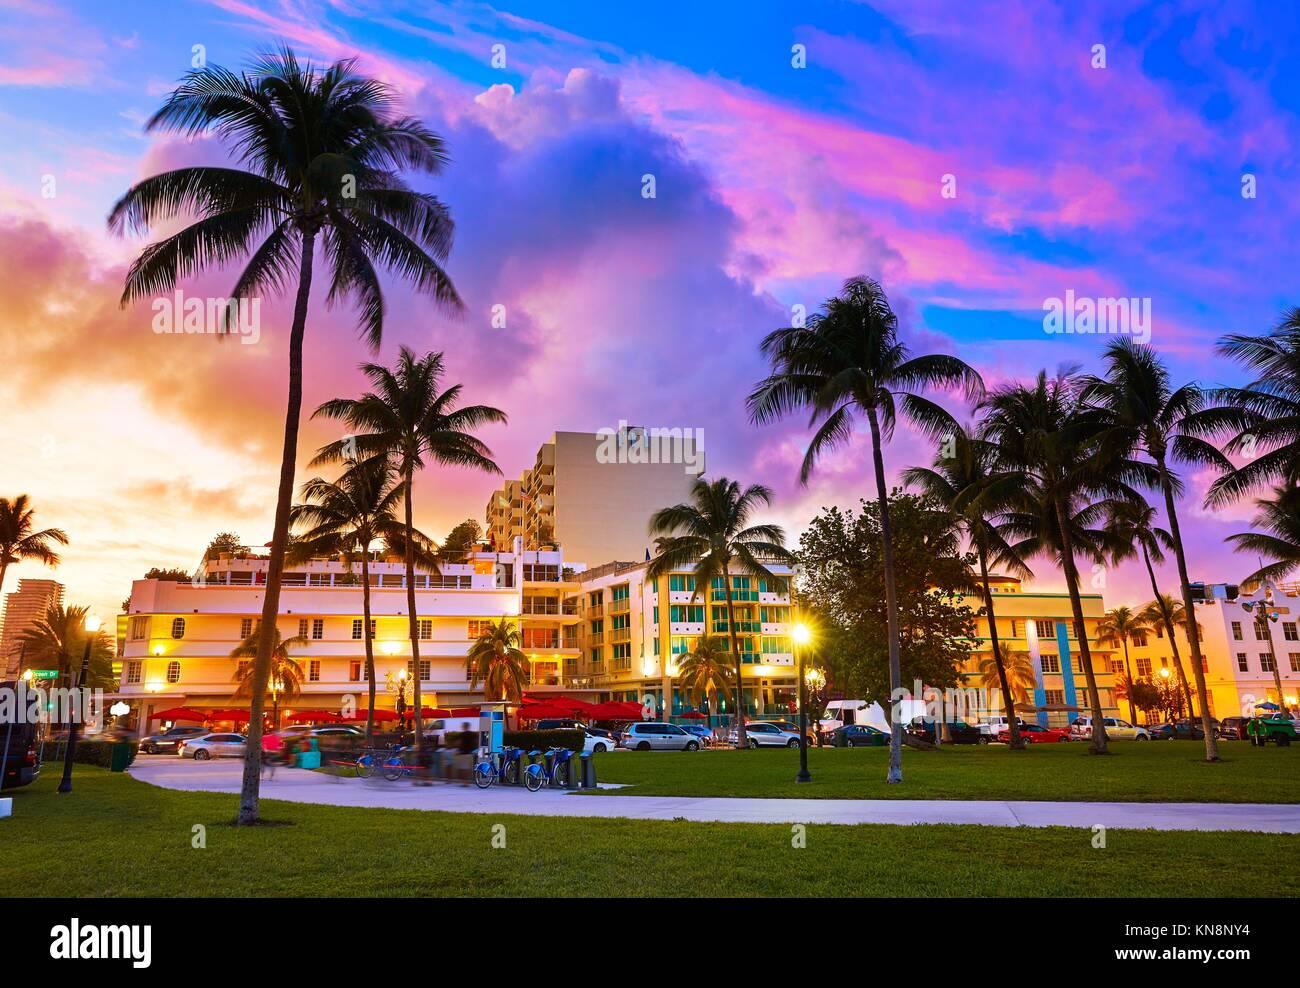 Miami Beach South Beach sunset in Ocean Drive Florida Art Deco. - Stock Image